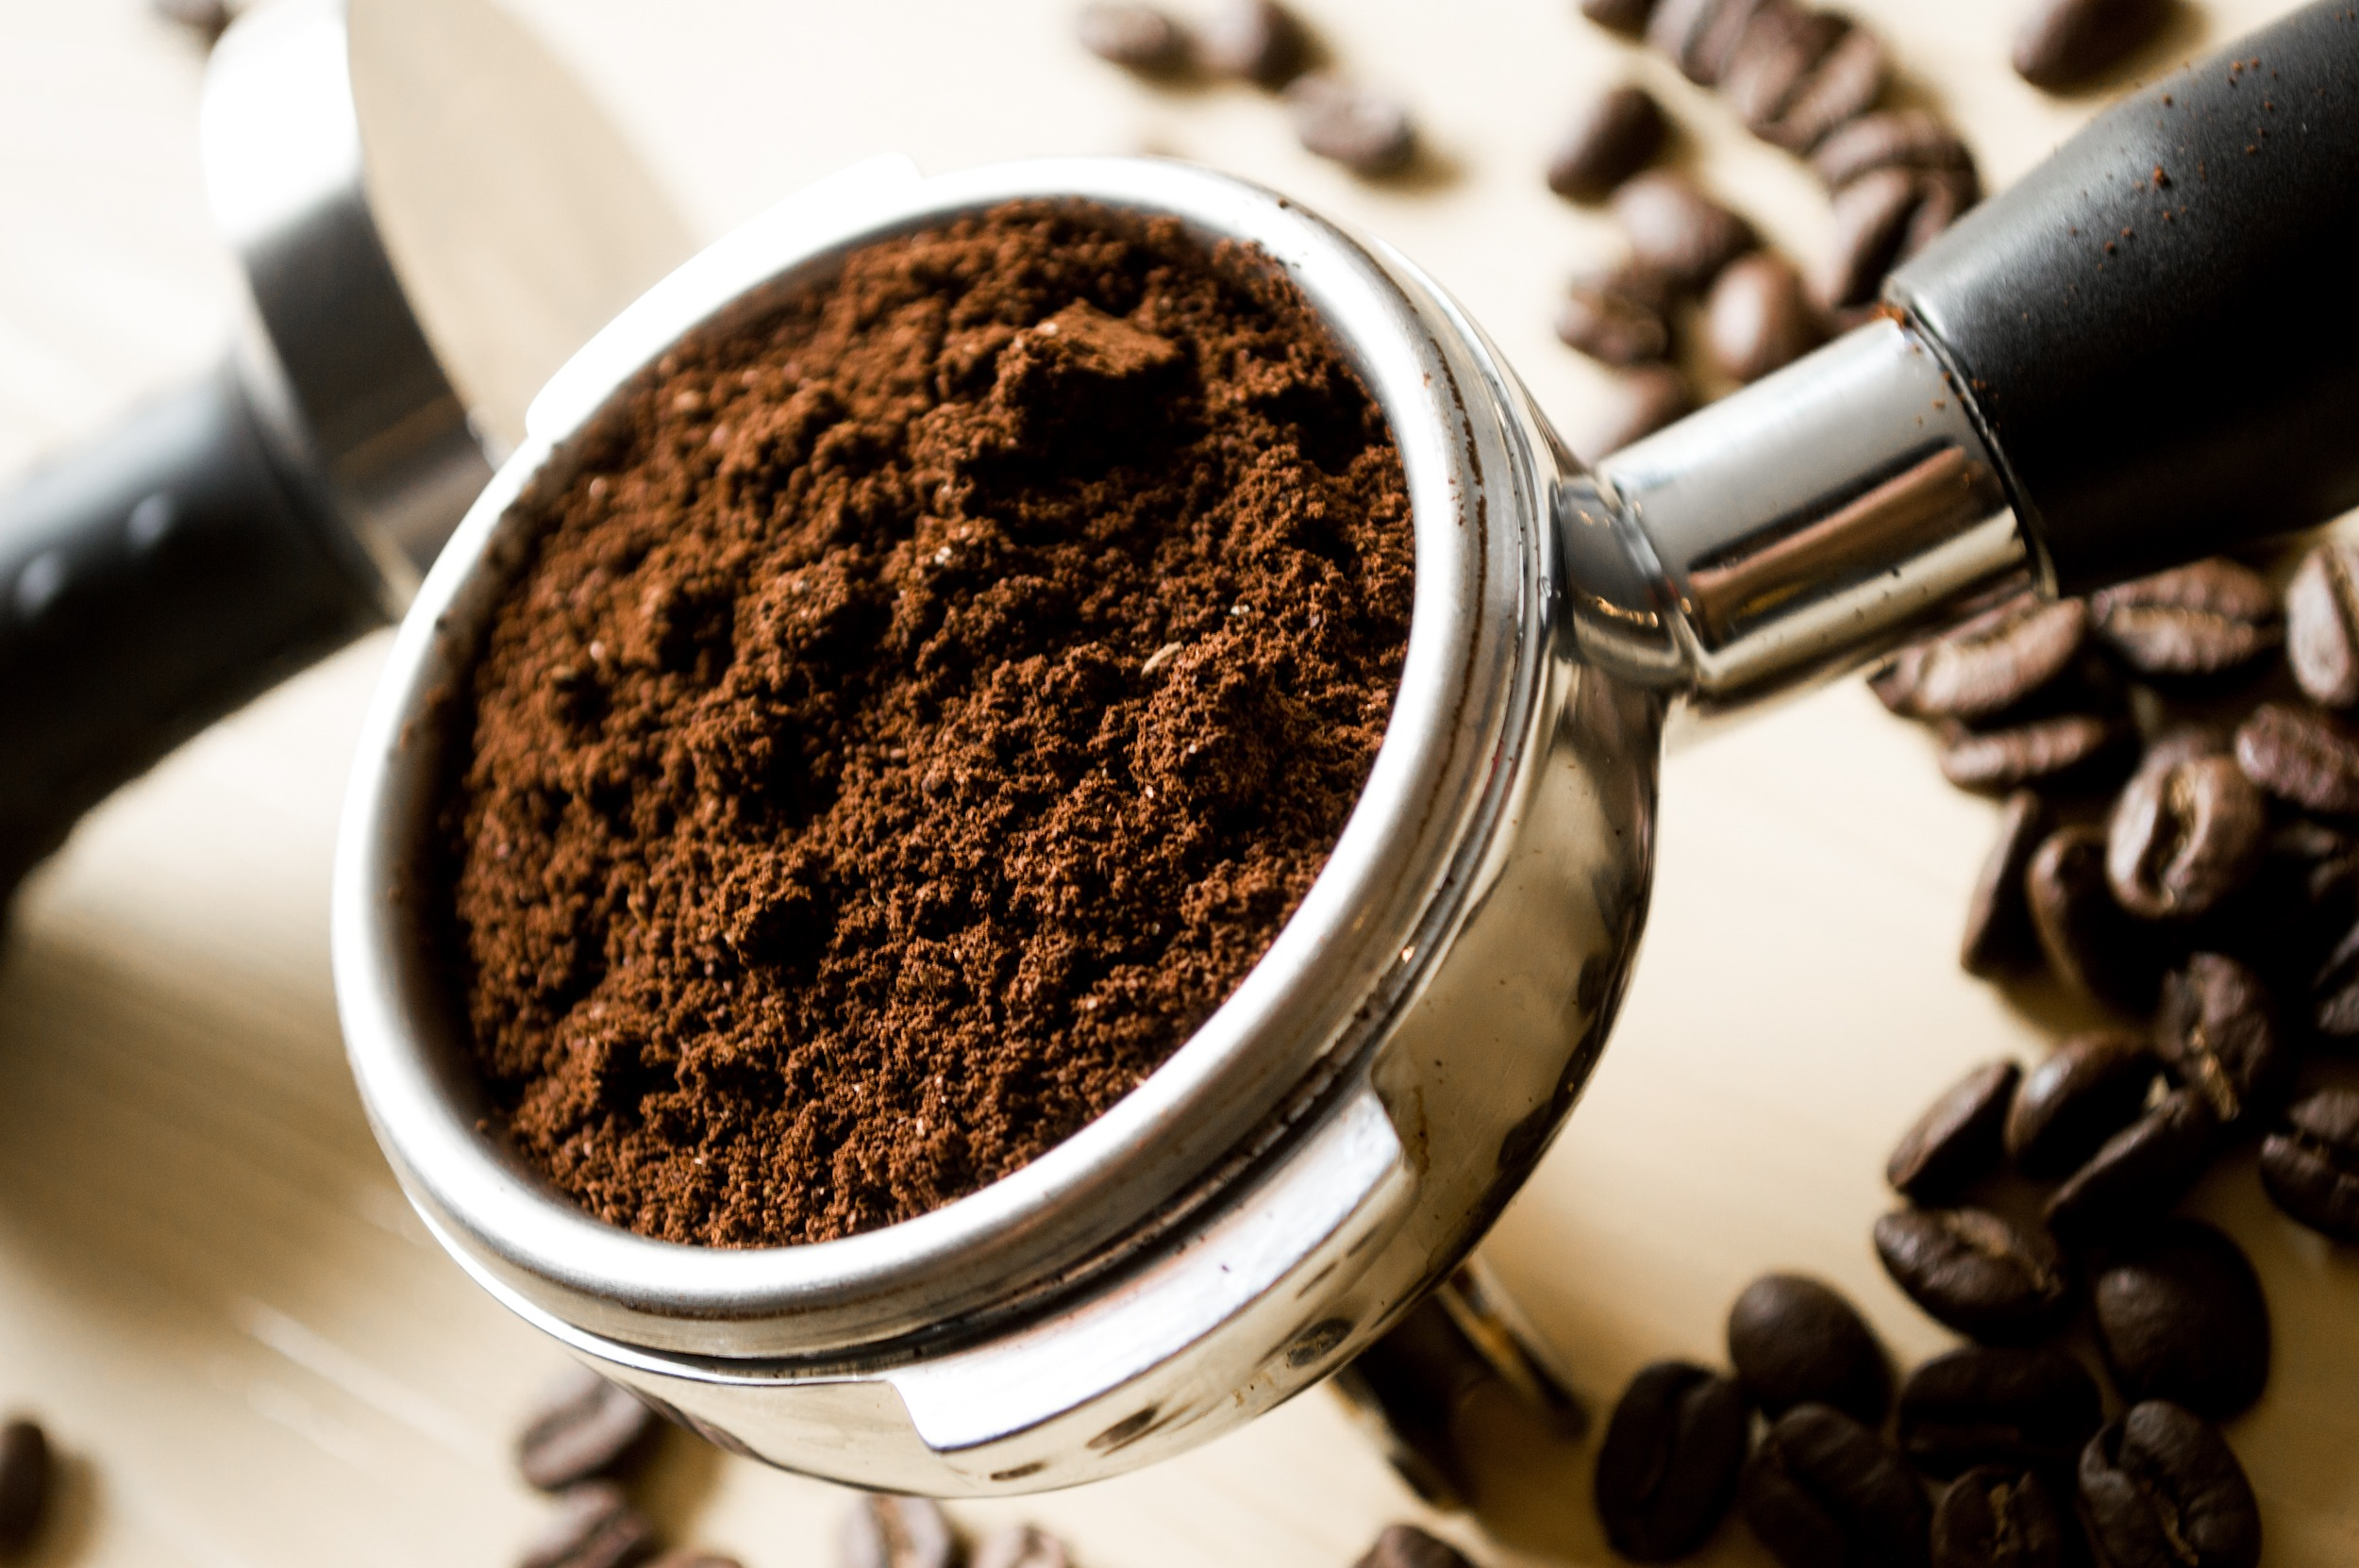 restaurant-beans-coffee-cup.jpg